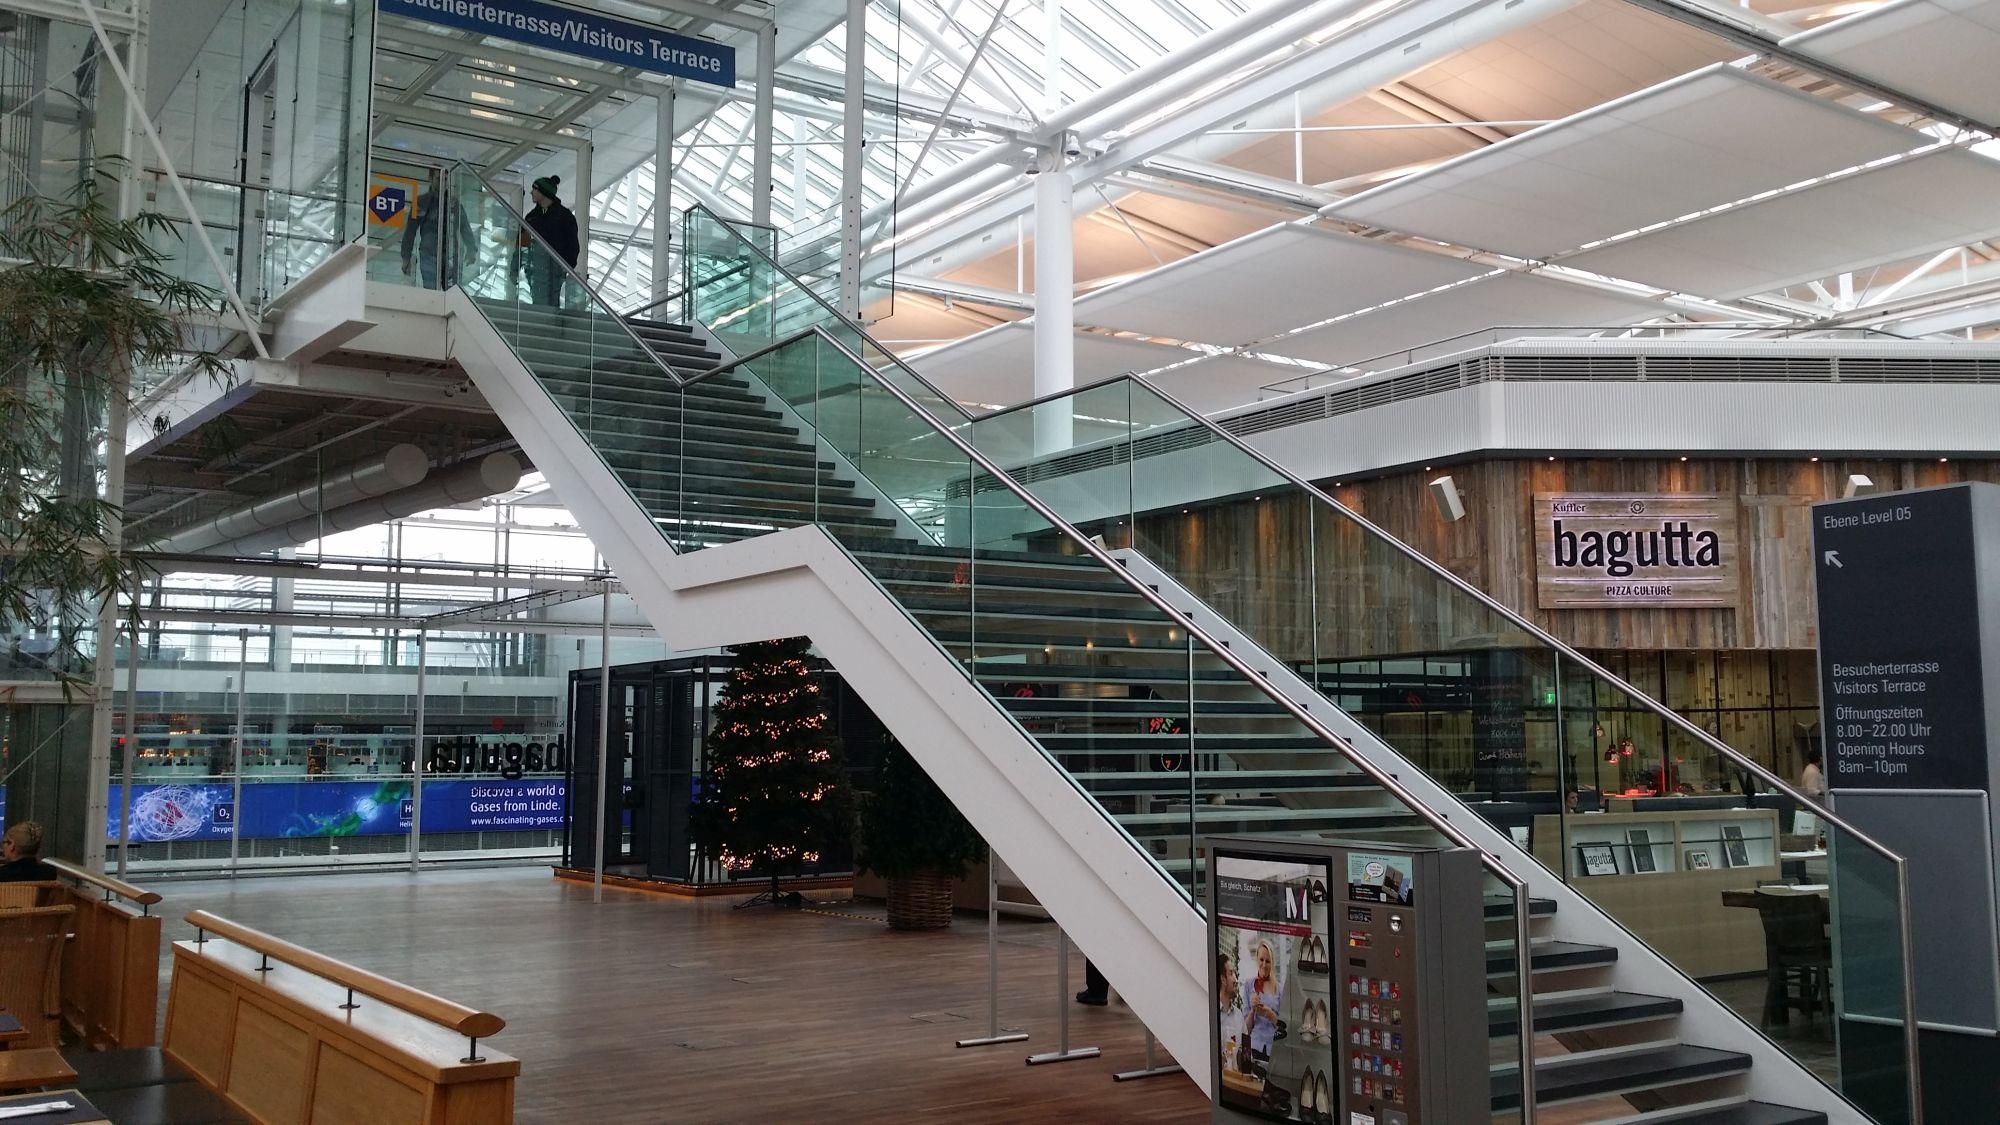 Munich Airport's Visitors Terrace